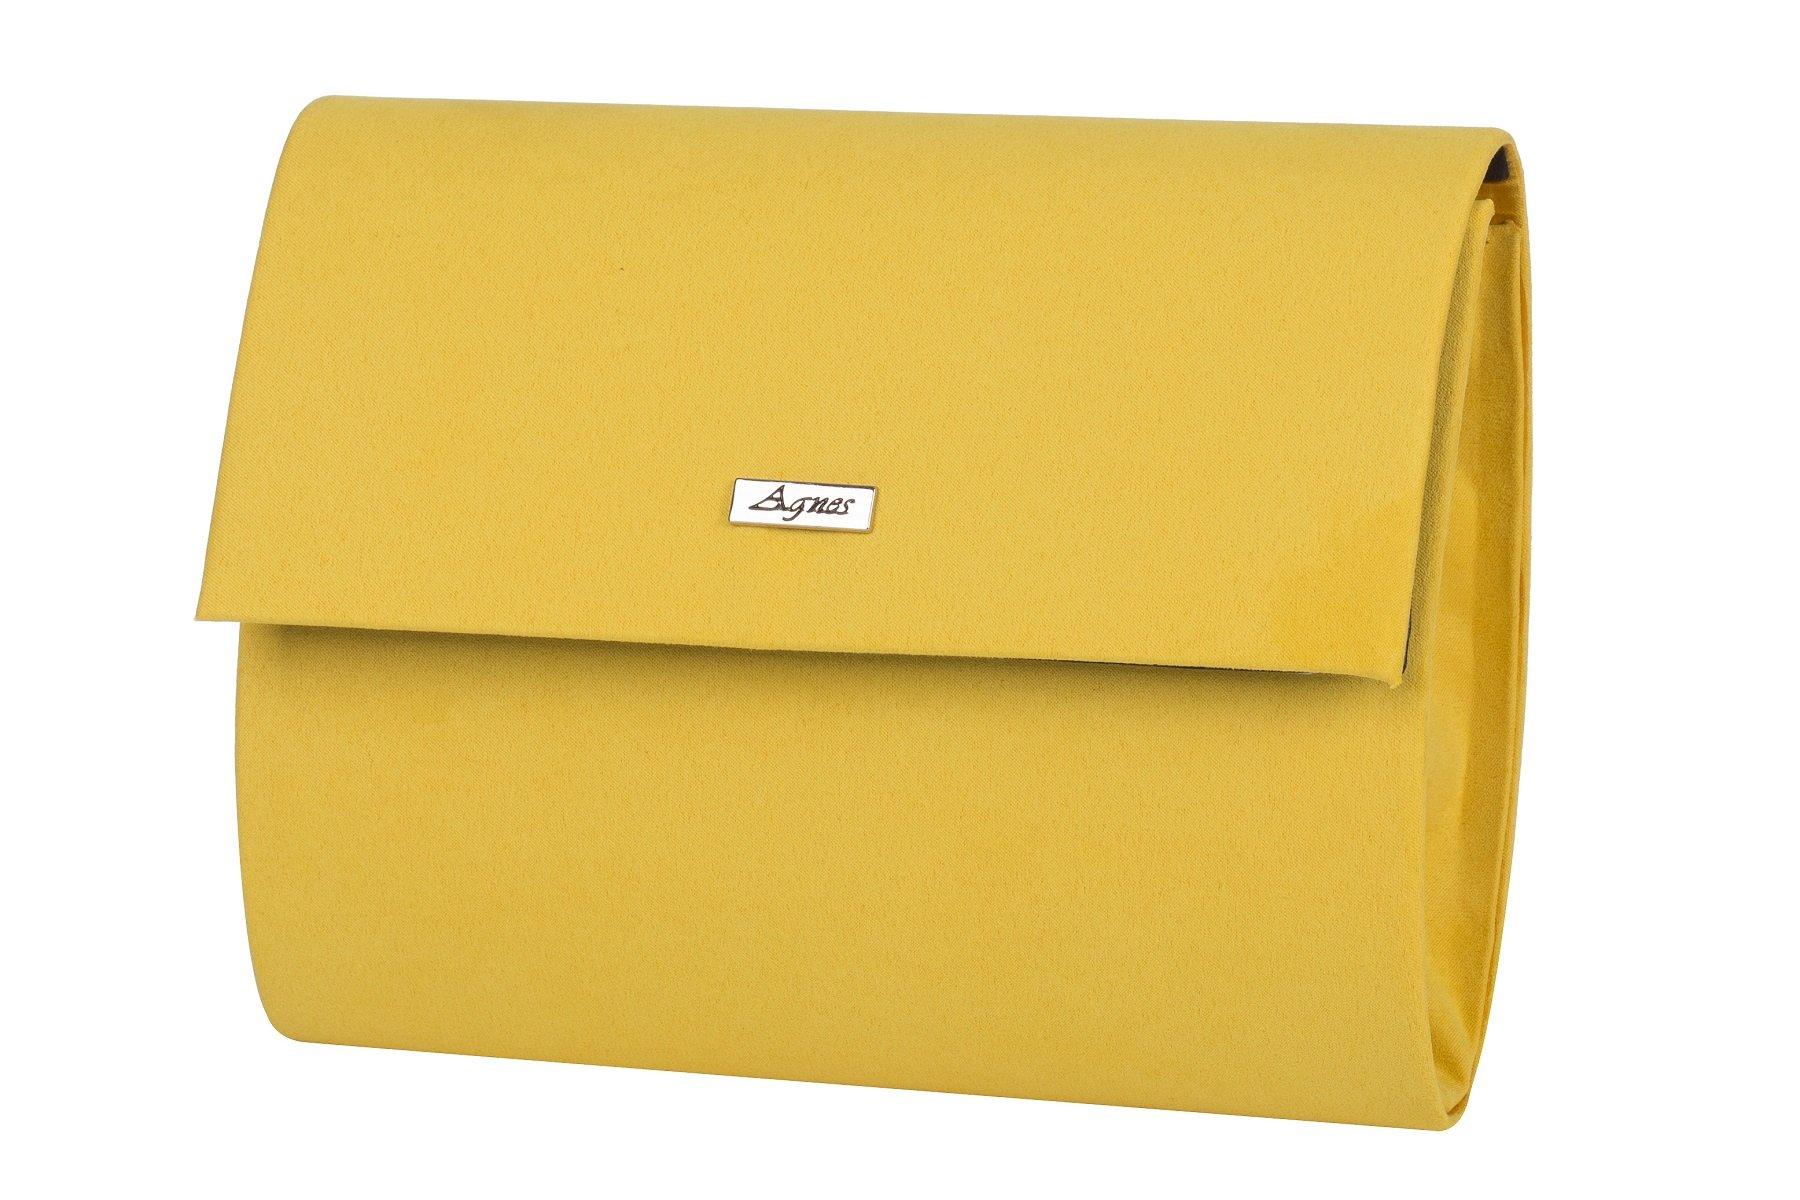 7d35a4ec7a194 Torebka damska wizytowa zamszowa kopertówka koperta - MB CLASSIC BAG